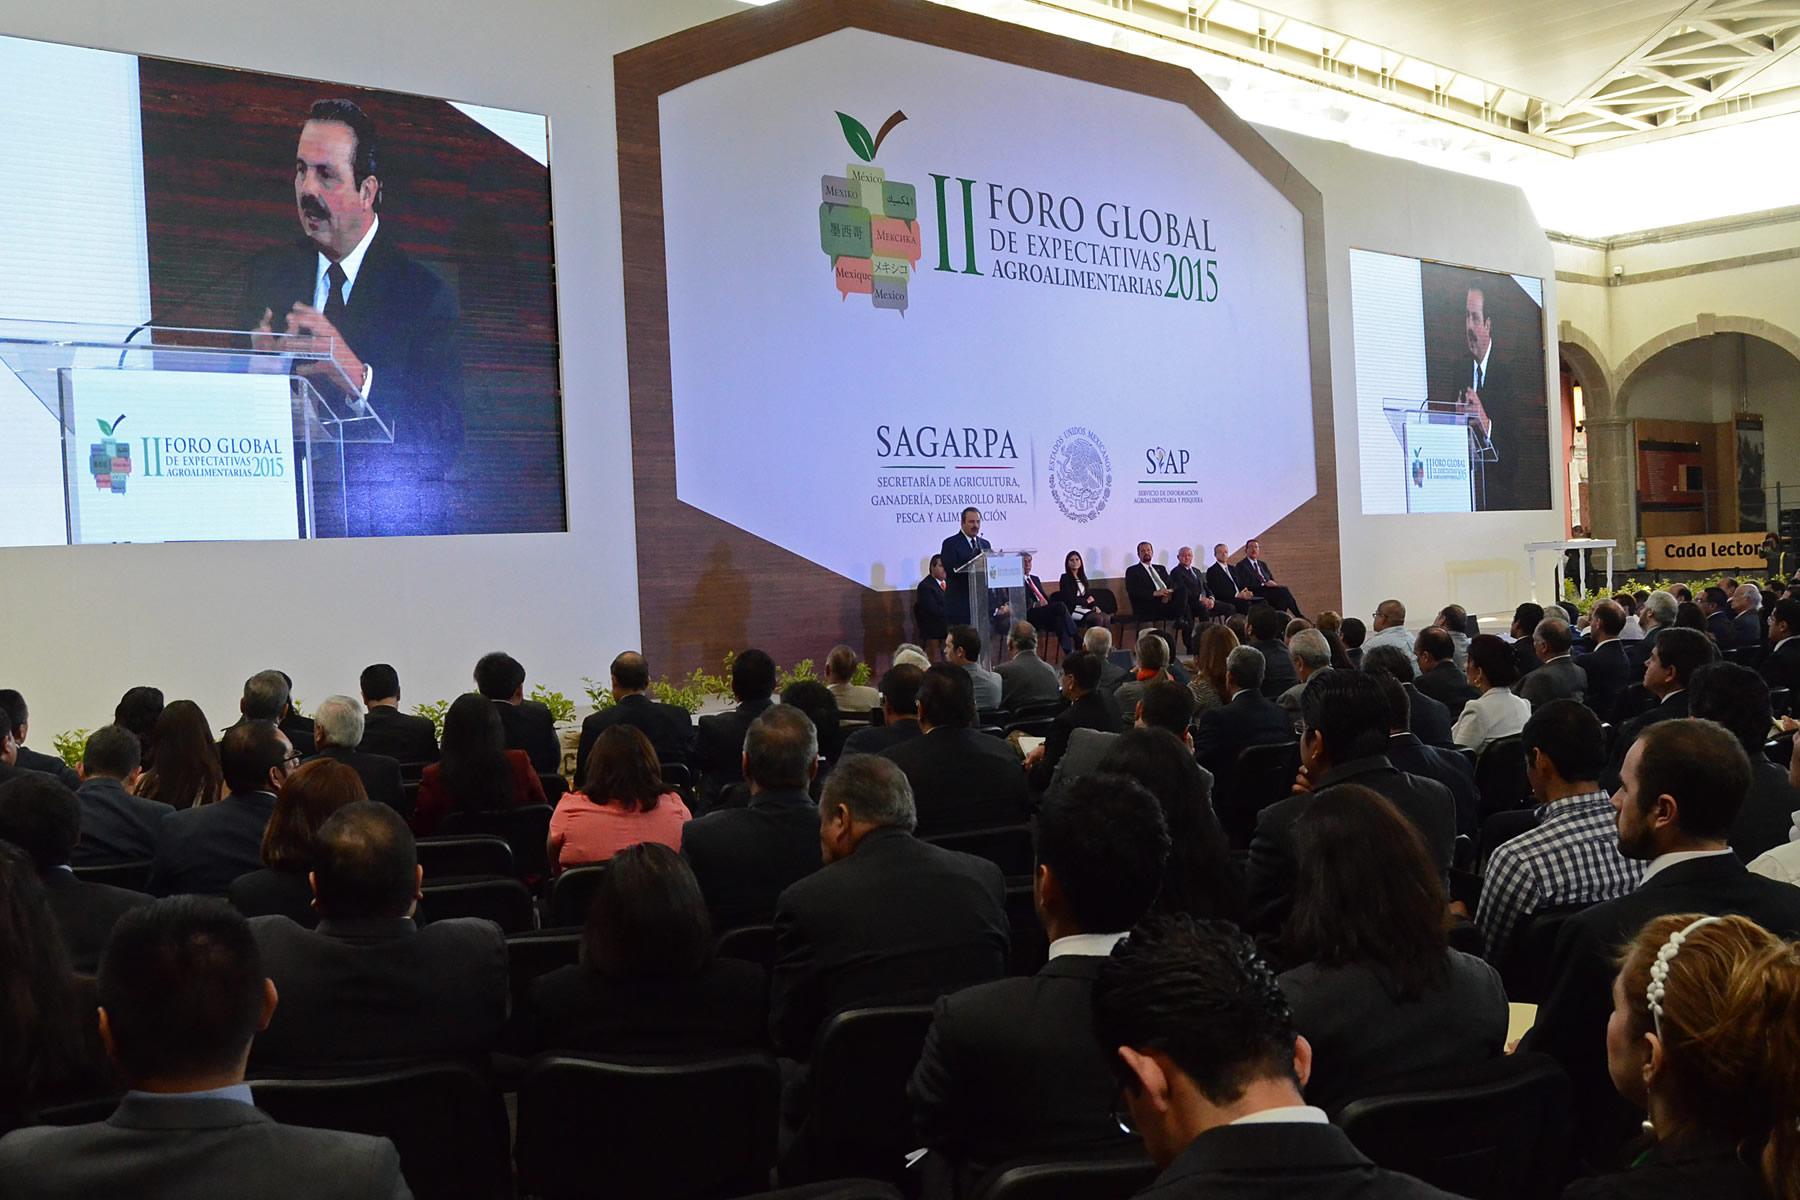 Impulsa México sistemas de información agroalimentaria; inciden en mejor planeación y ordenamiento de mercados.